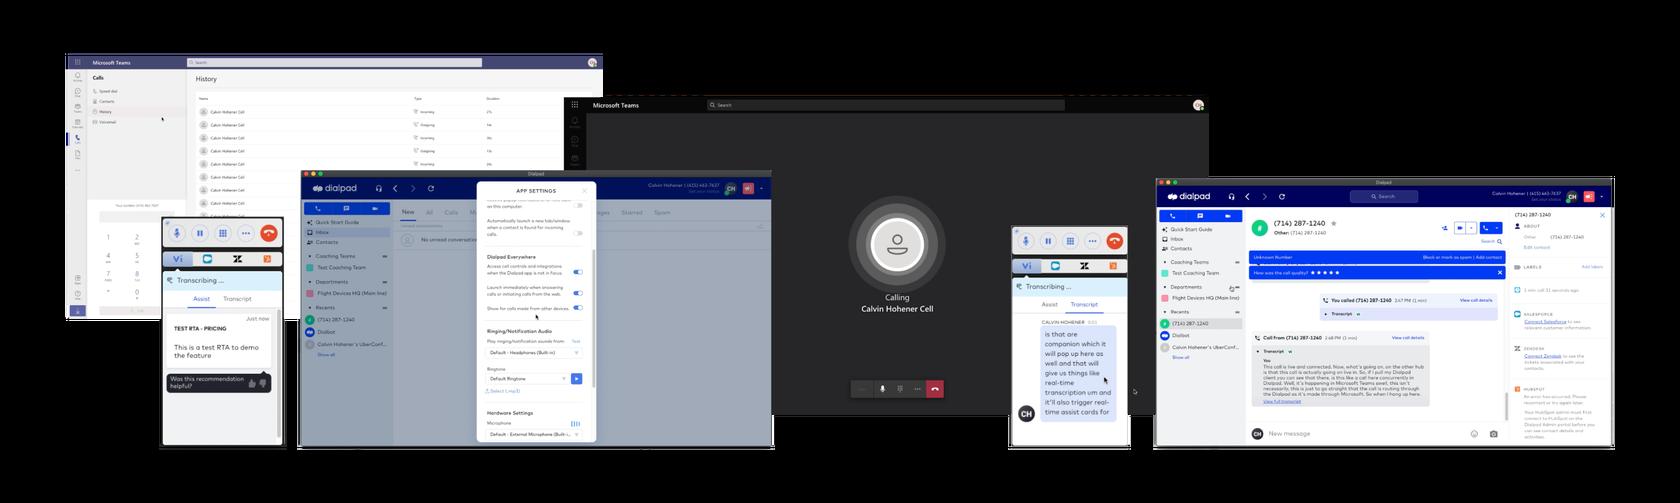 Dialpad for Microsoft Teams